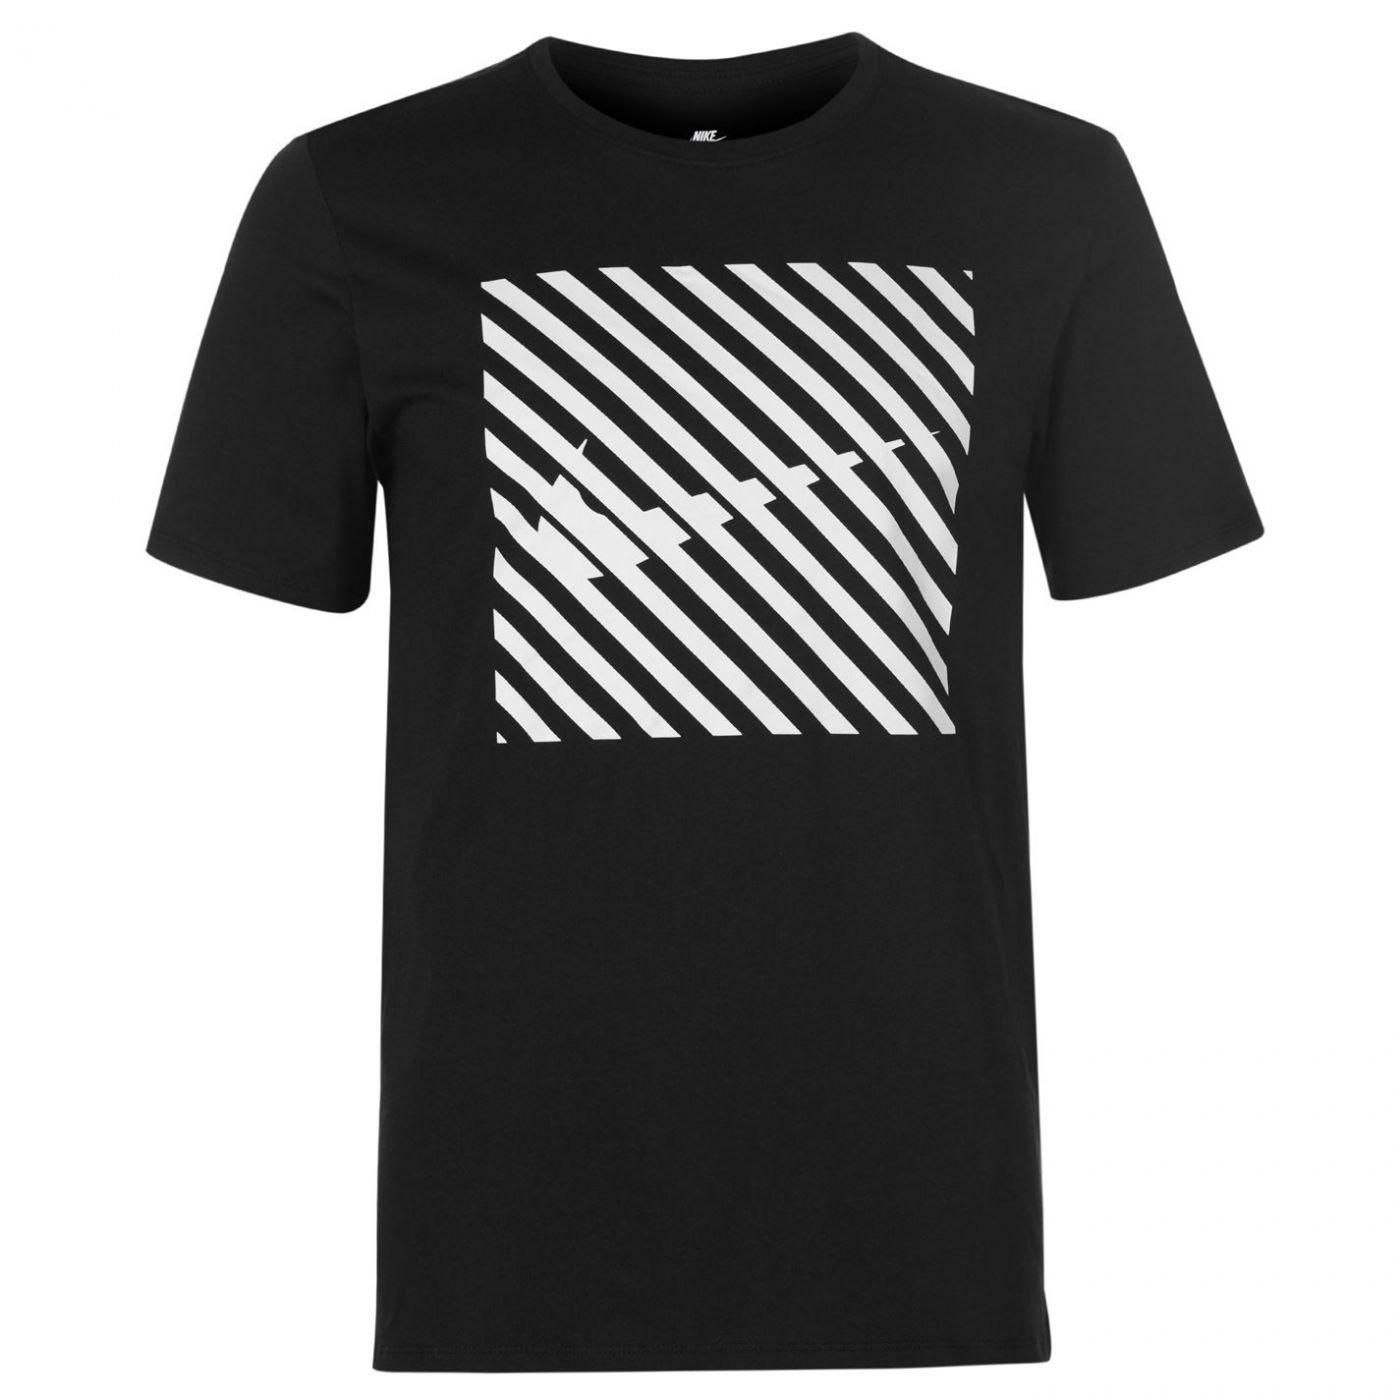 Nike Swoosh Thru Graphic T Shirt Mens